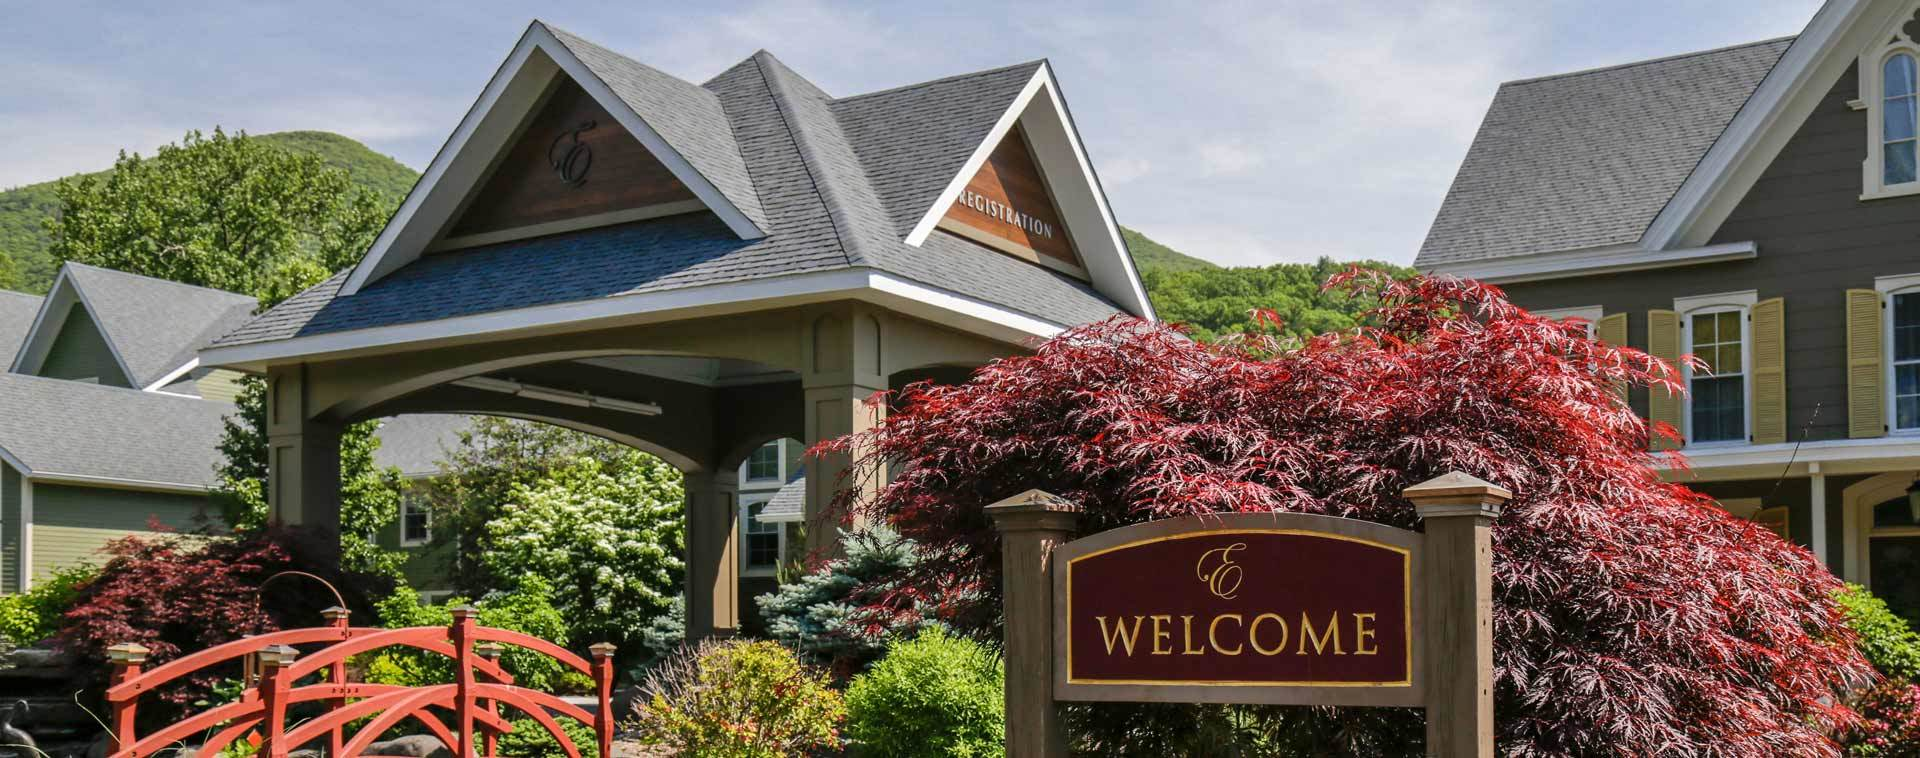 Emerson Resort Entrance - Catskill, NY